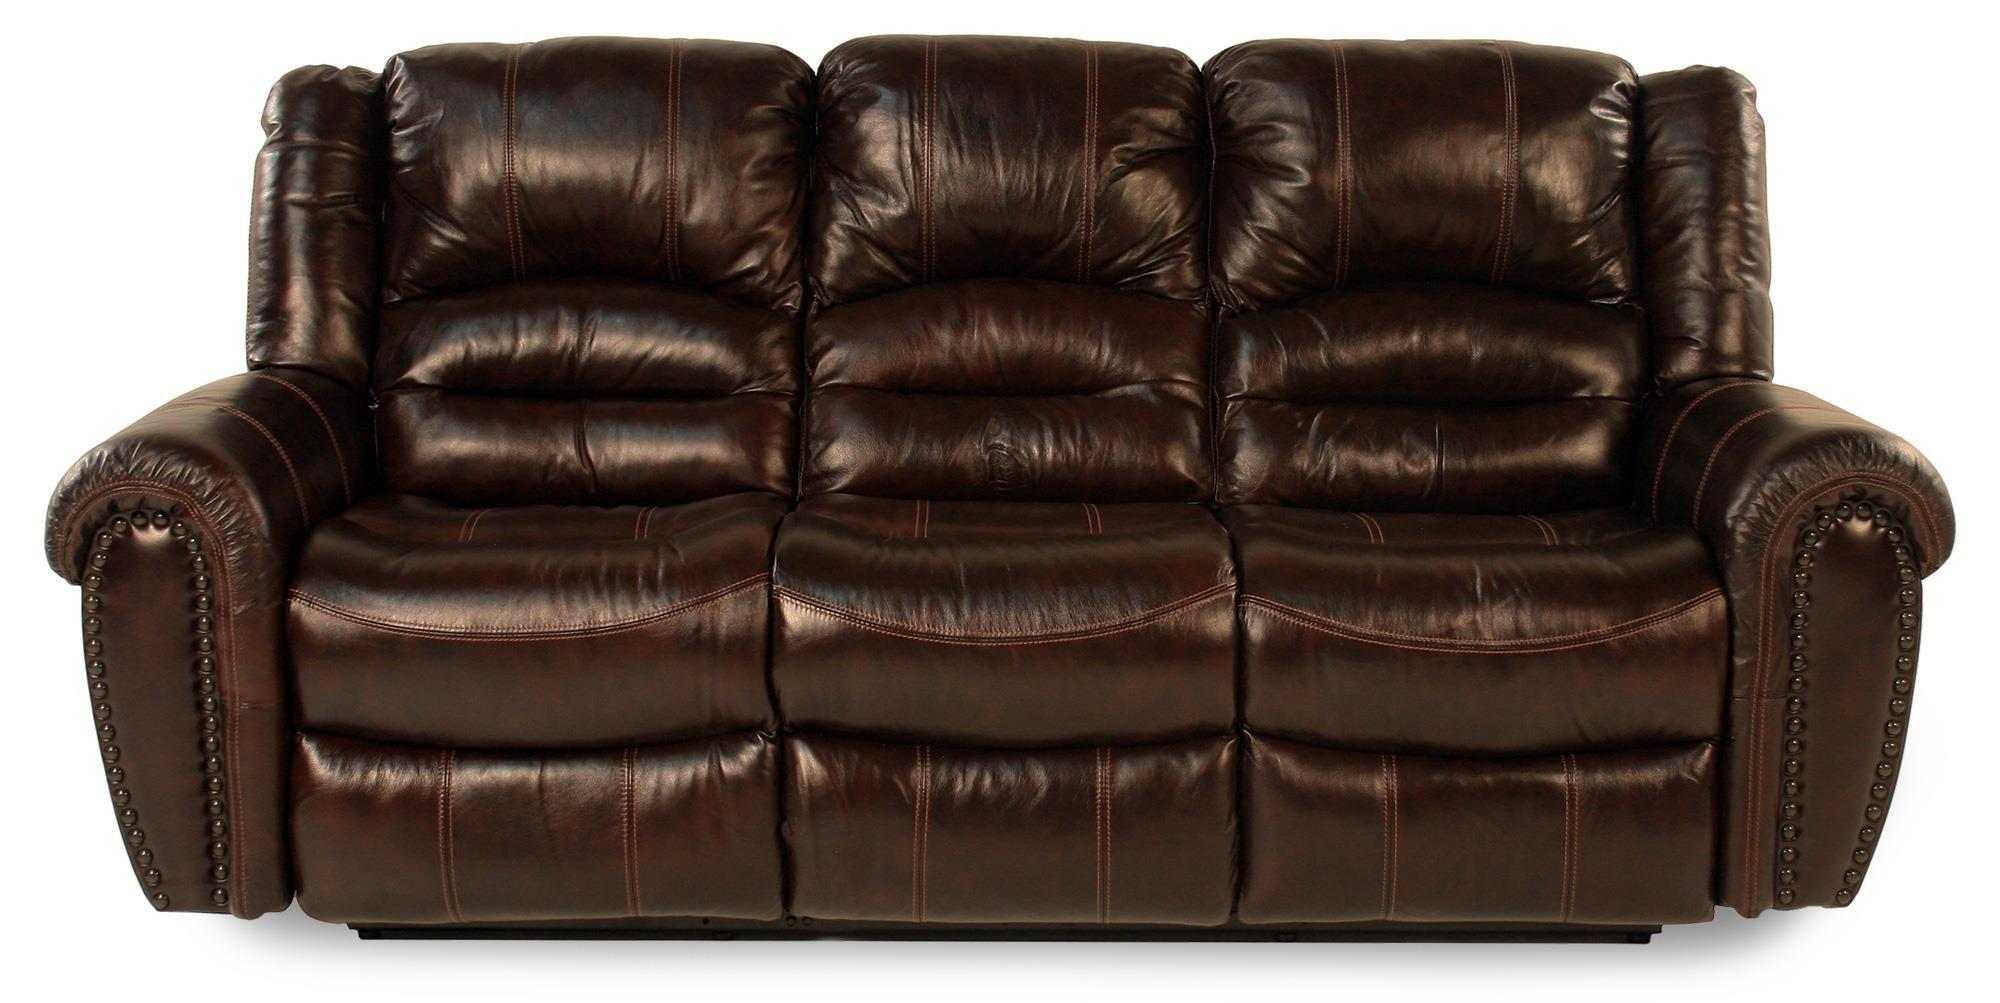 Flexsteel LancerLeather Reclining Sofa